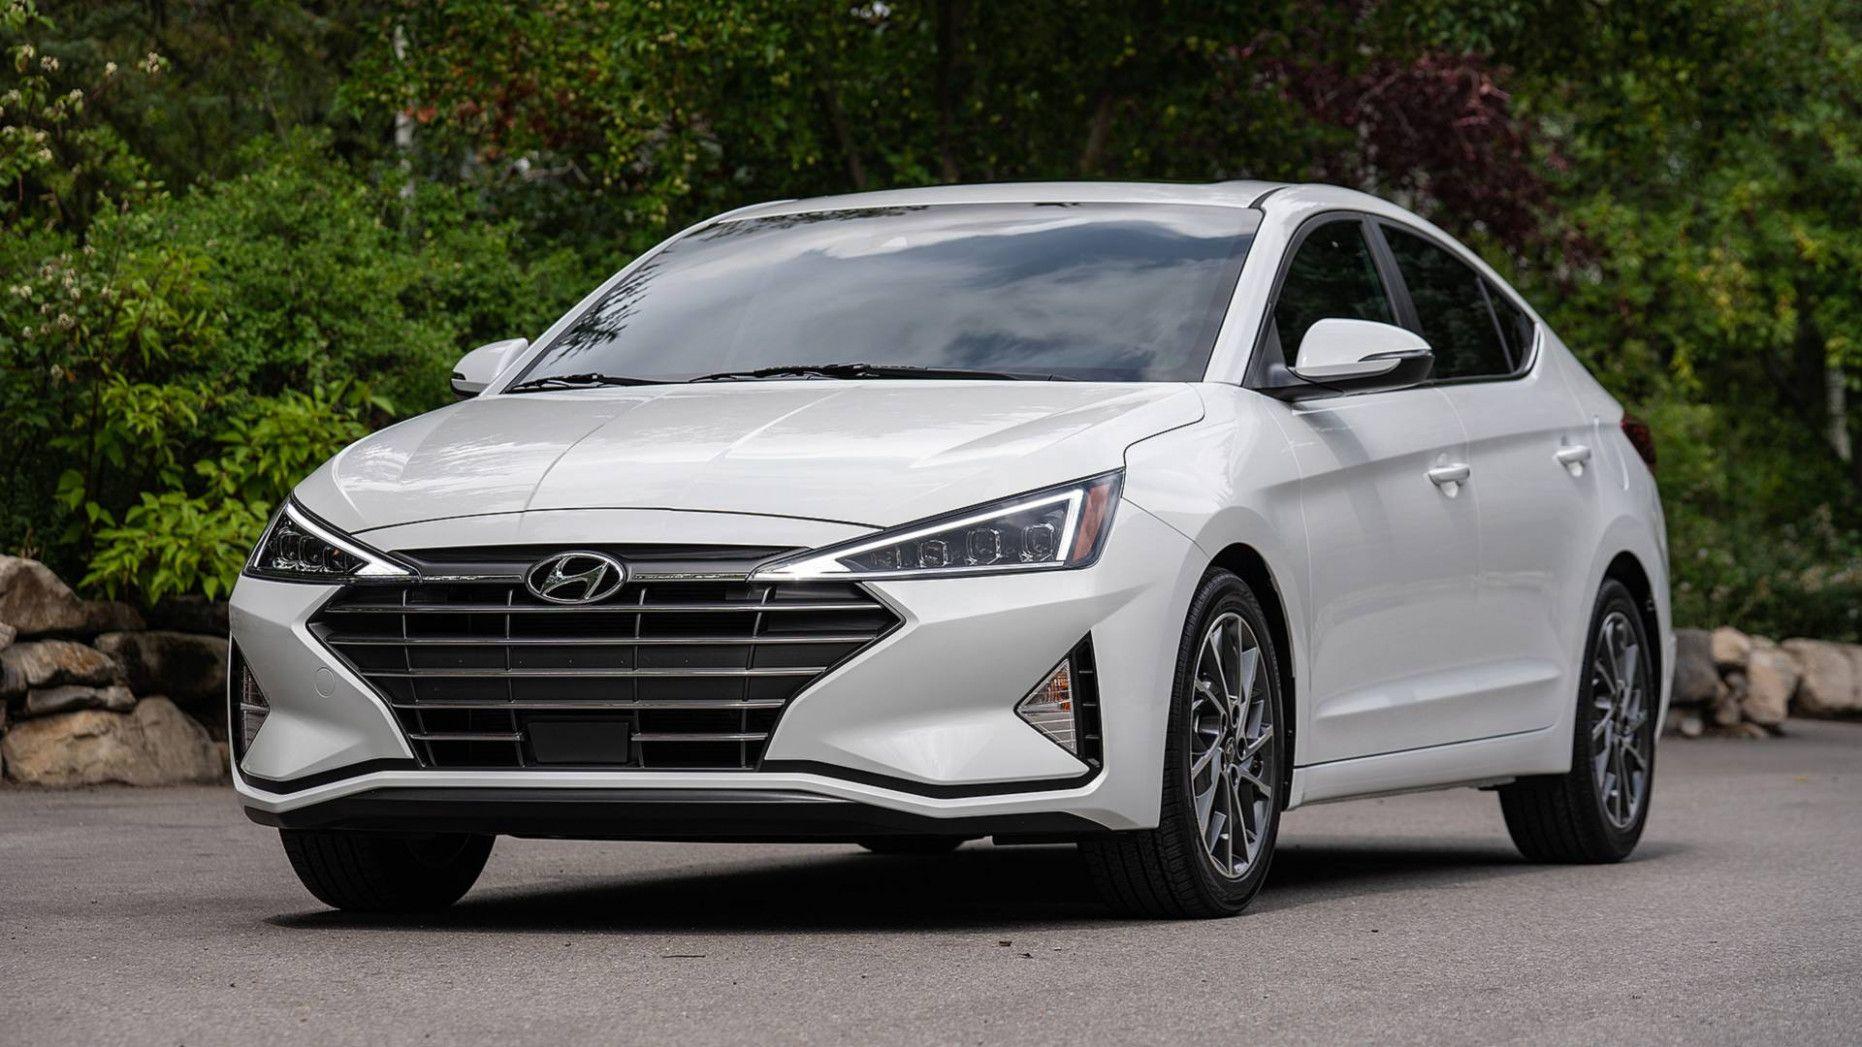 Hyundai Venue Price In India 2020 Overview Car Rental Company Hyundai Dubai Rent